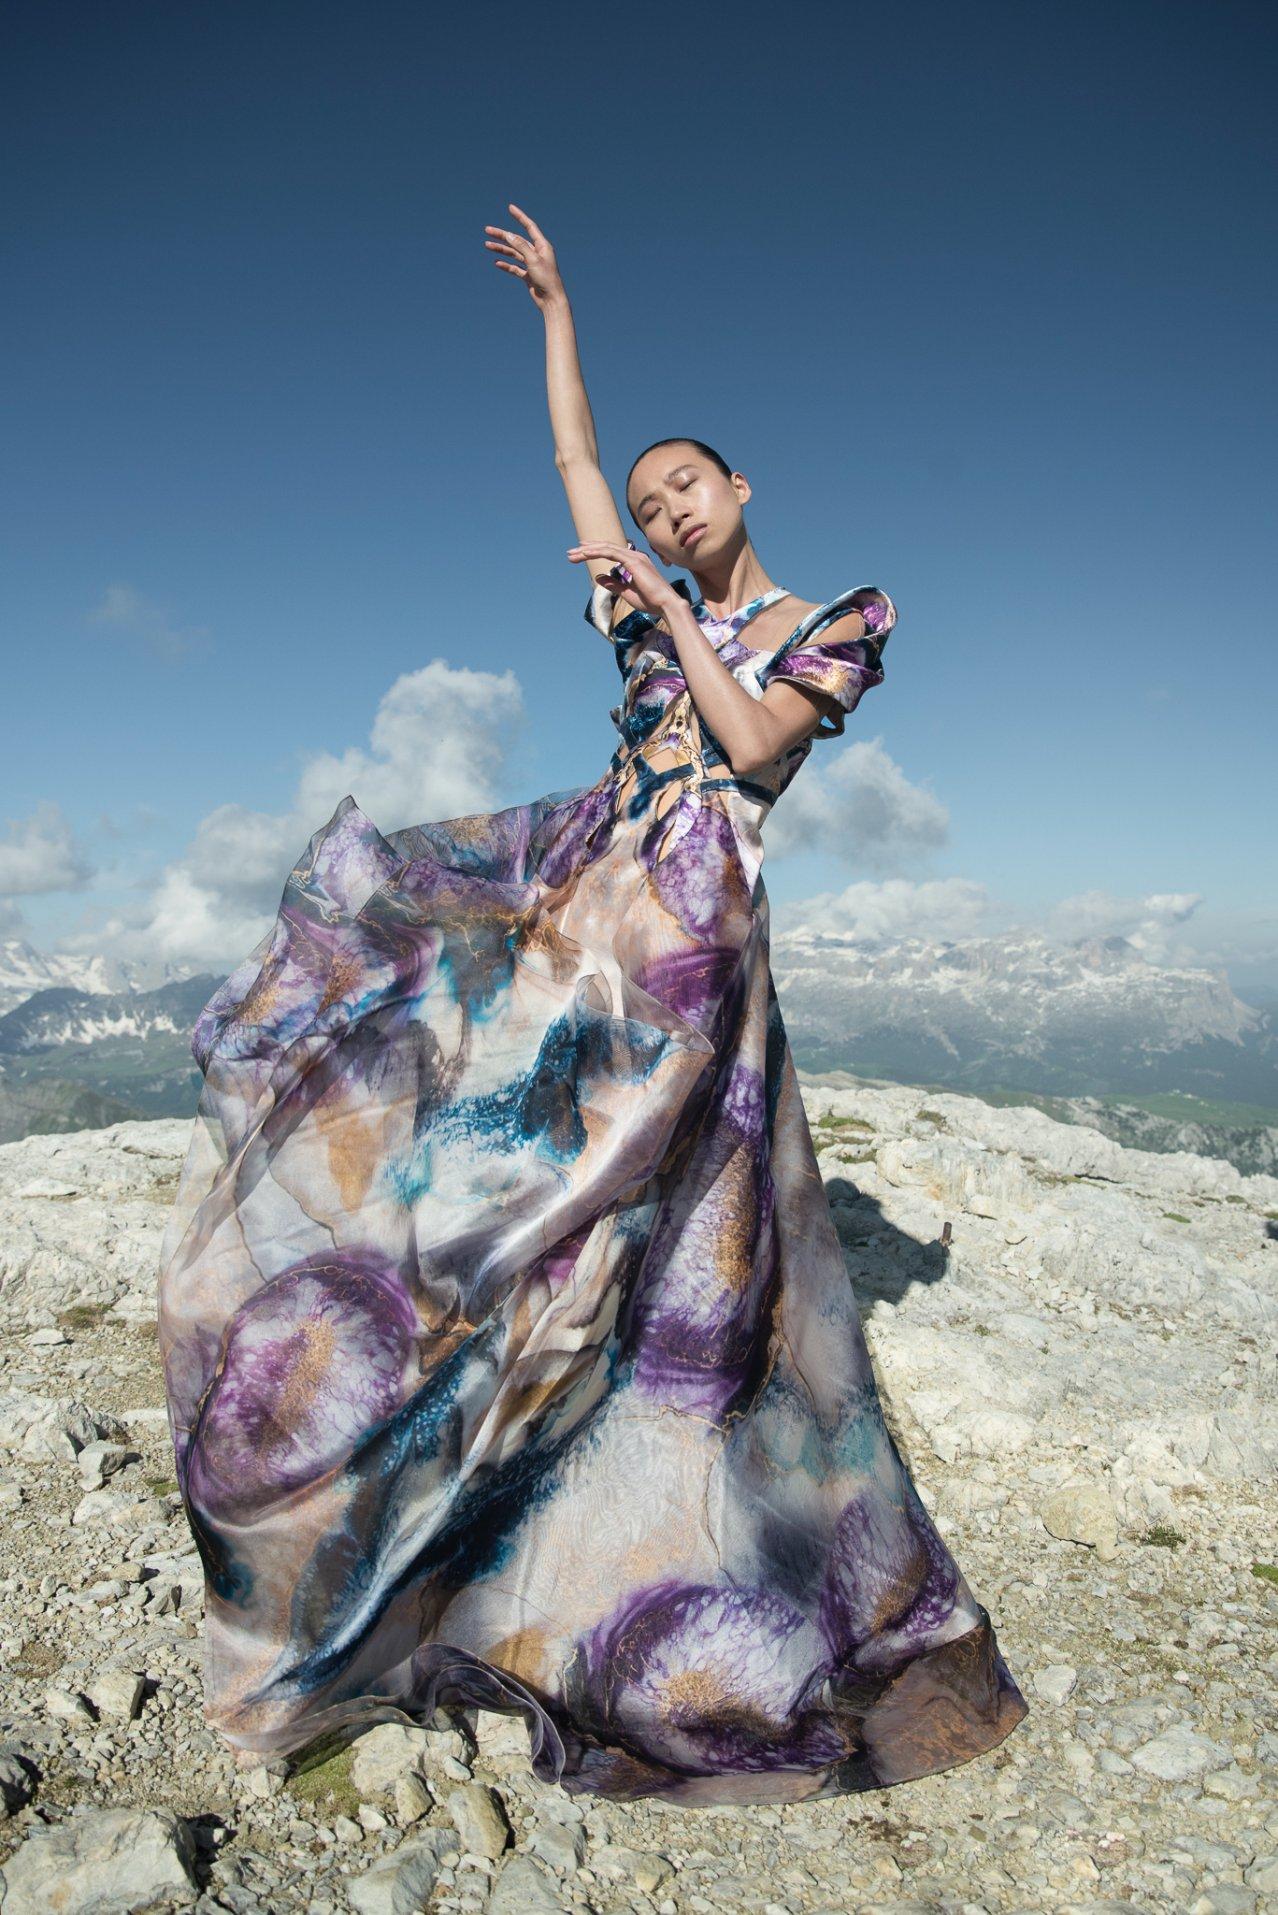 Iris-van-Herpen-AW21_22-Earthrise-Photography-by-Siermond-Nicholas-Fols-XIV